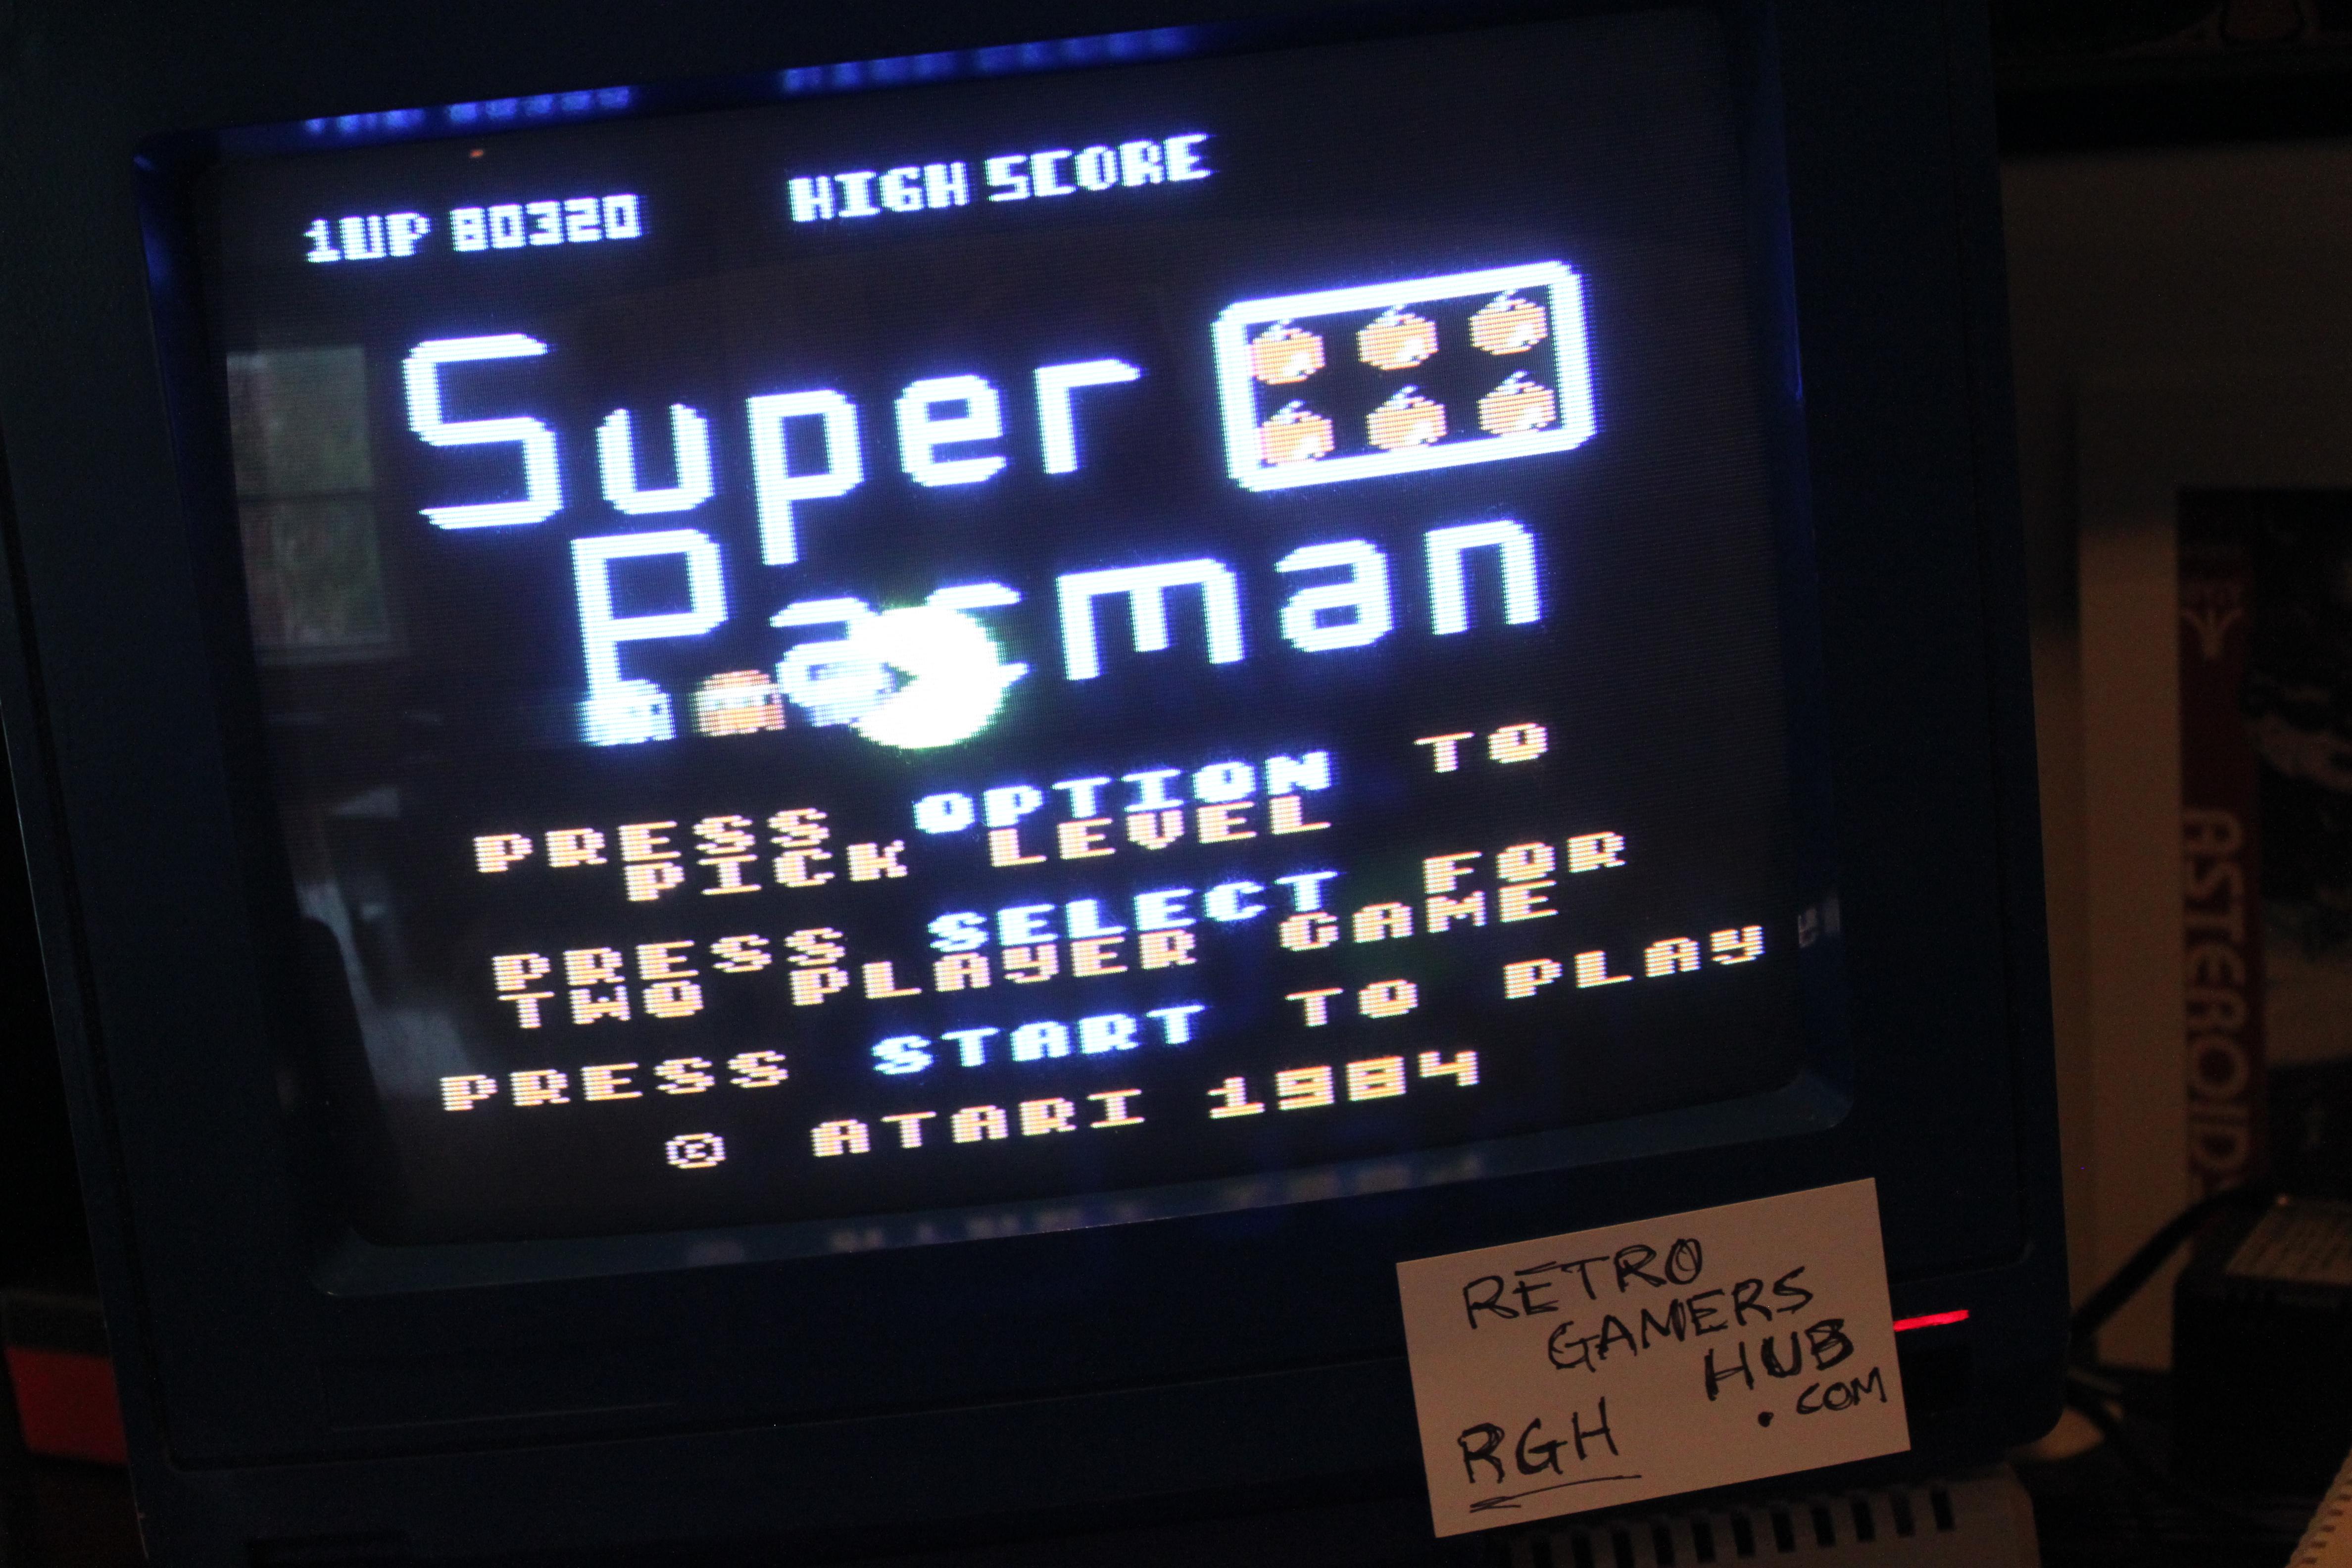 RetroGamersHub: Super Pacman [Default settings] (Atari 400/800/XL/XE) 80,320 points on 2016-10-02 07:44:43